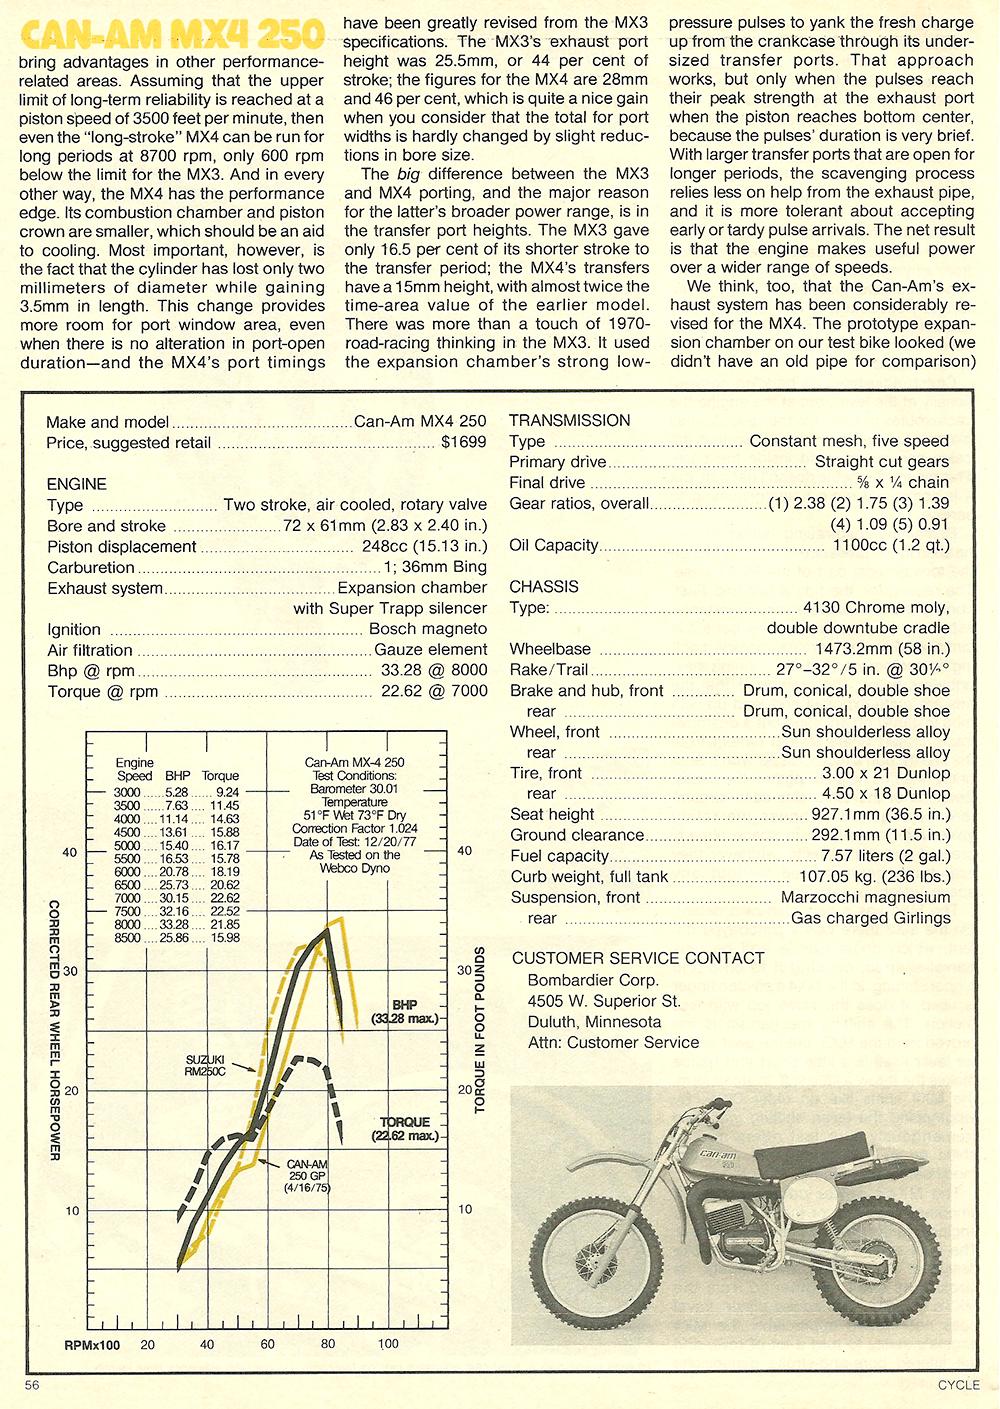 1978 Can-Am MX4 250 road test 5.jpg